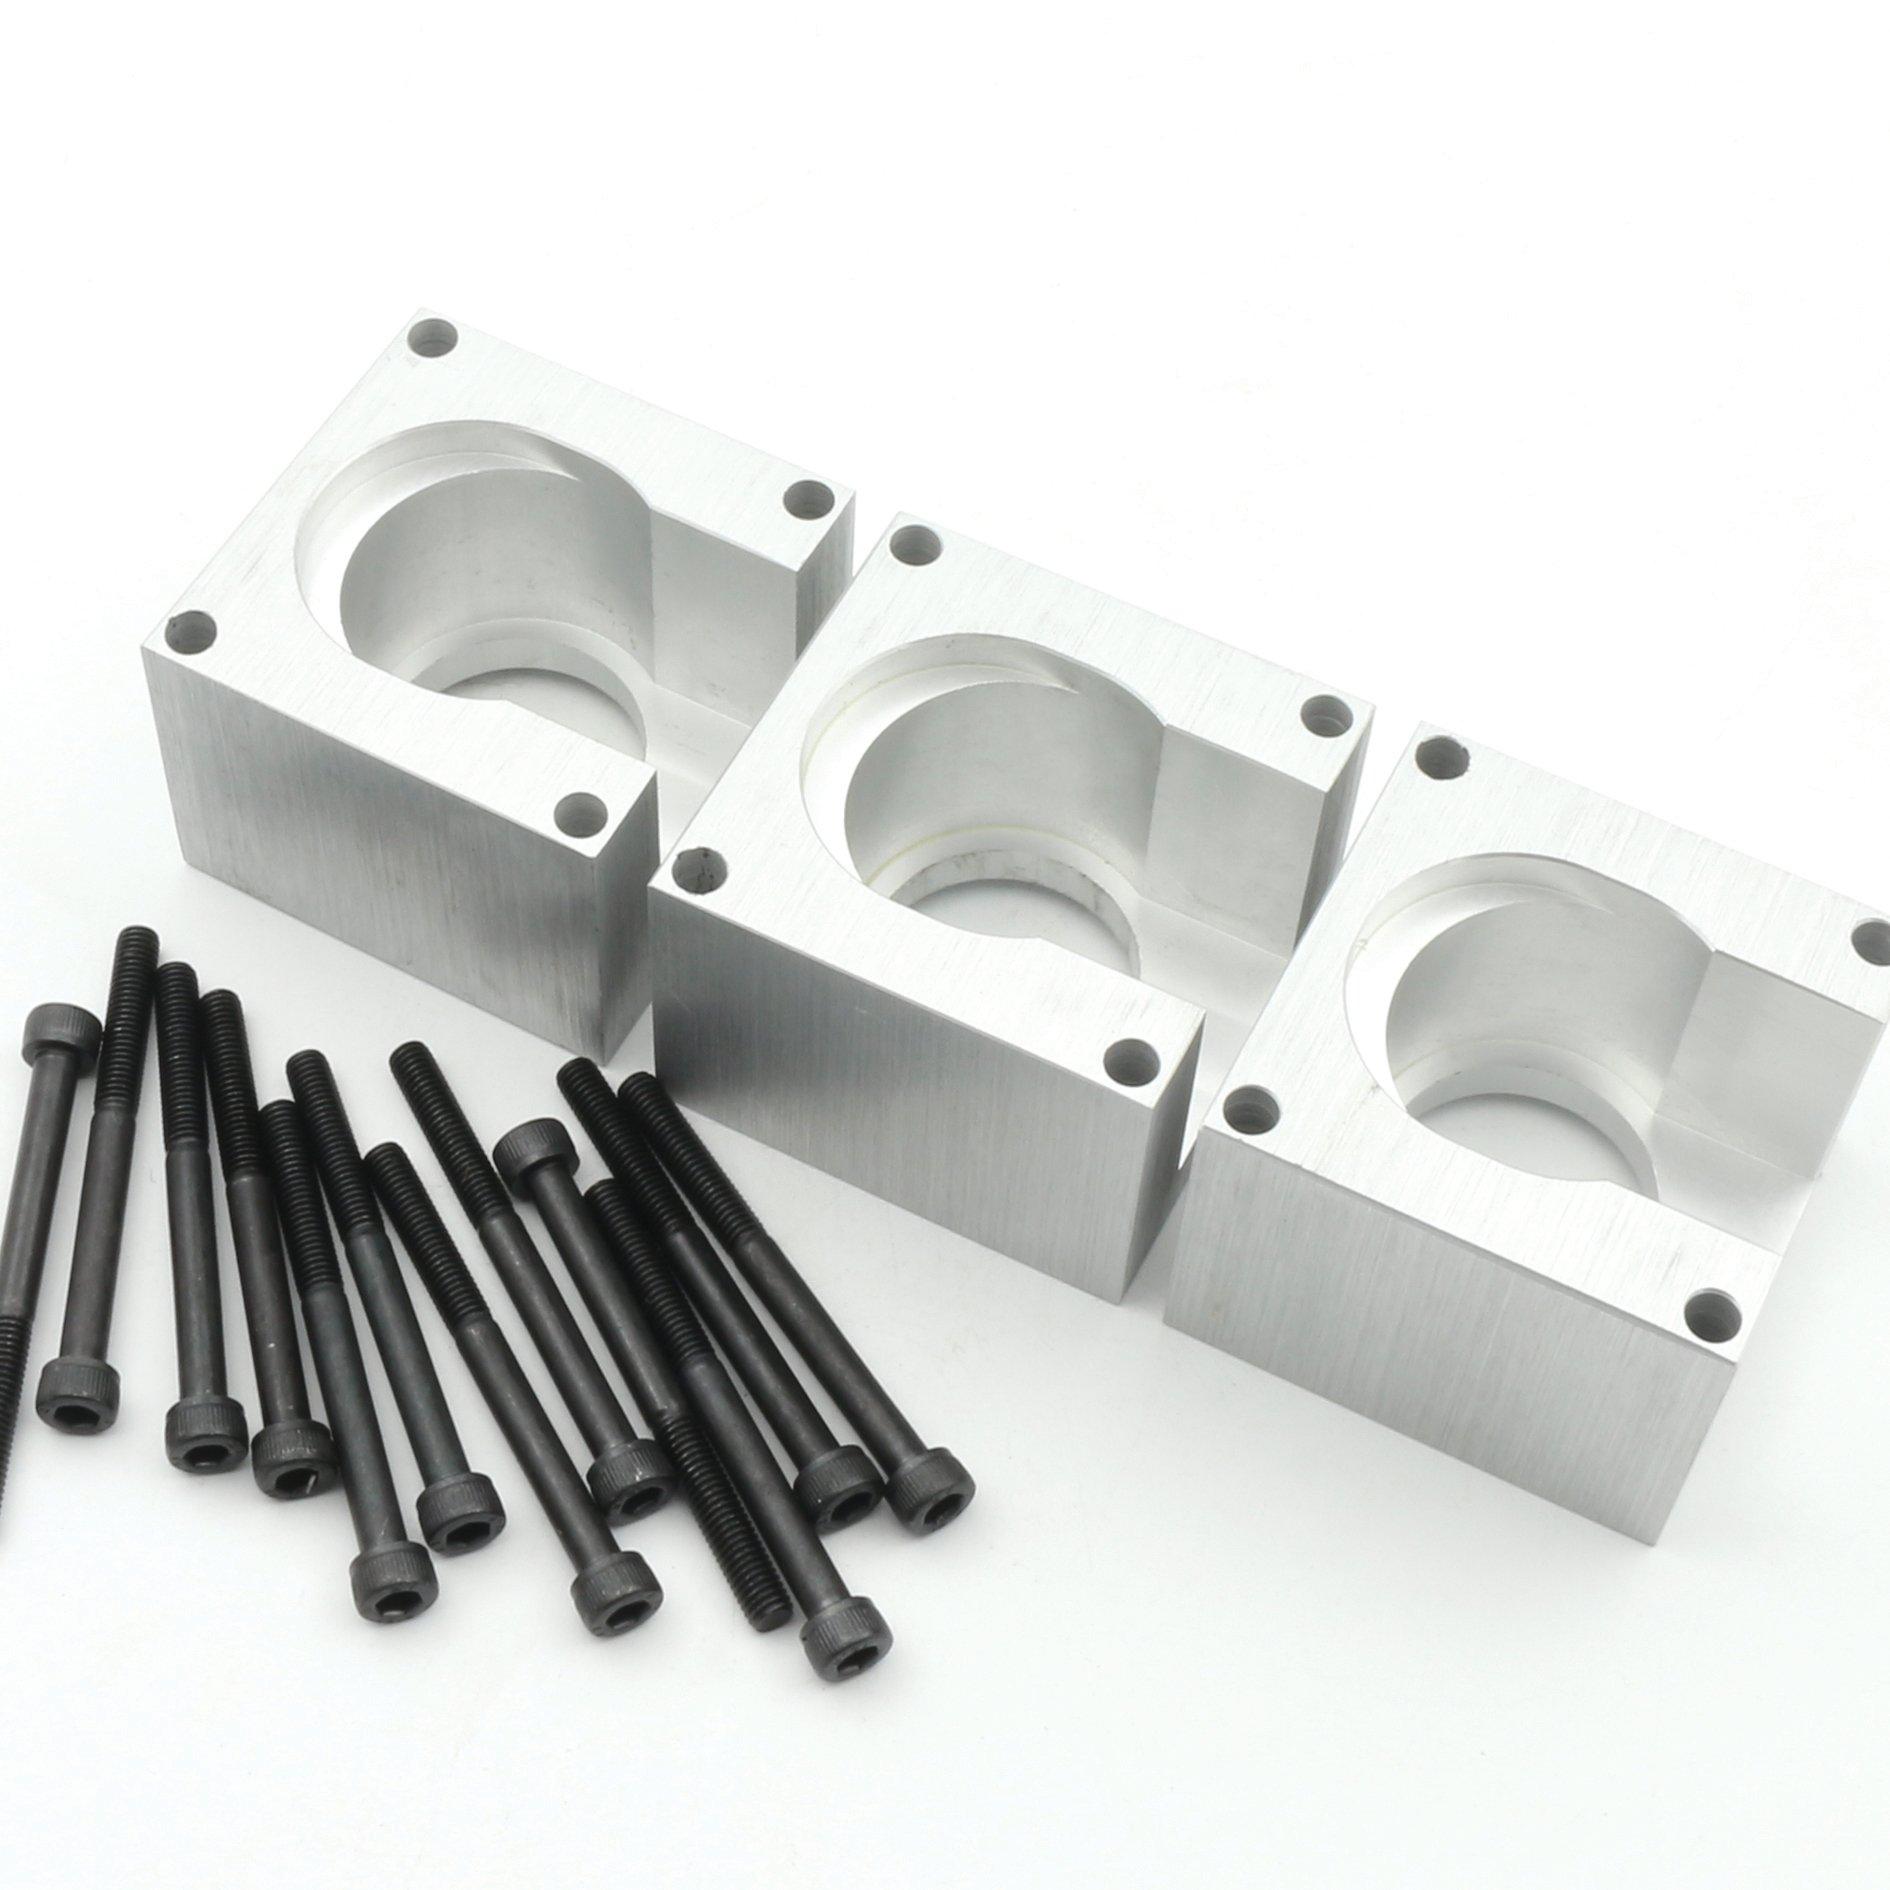 3Set Aluminum Nema23 Stepper Motor Mount Bracket Holder Clamp Support Block+12pcs Installation Screw for CNC Router Engraving Milling Machine …